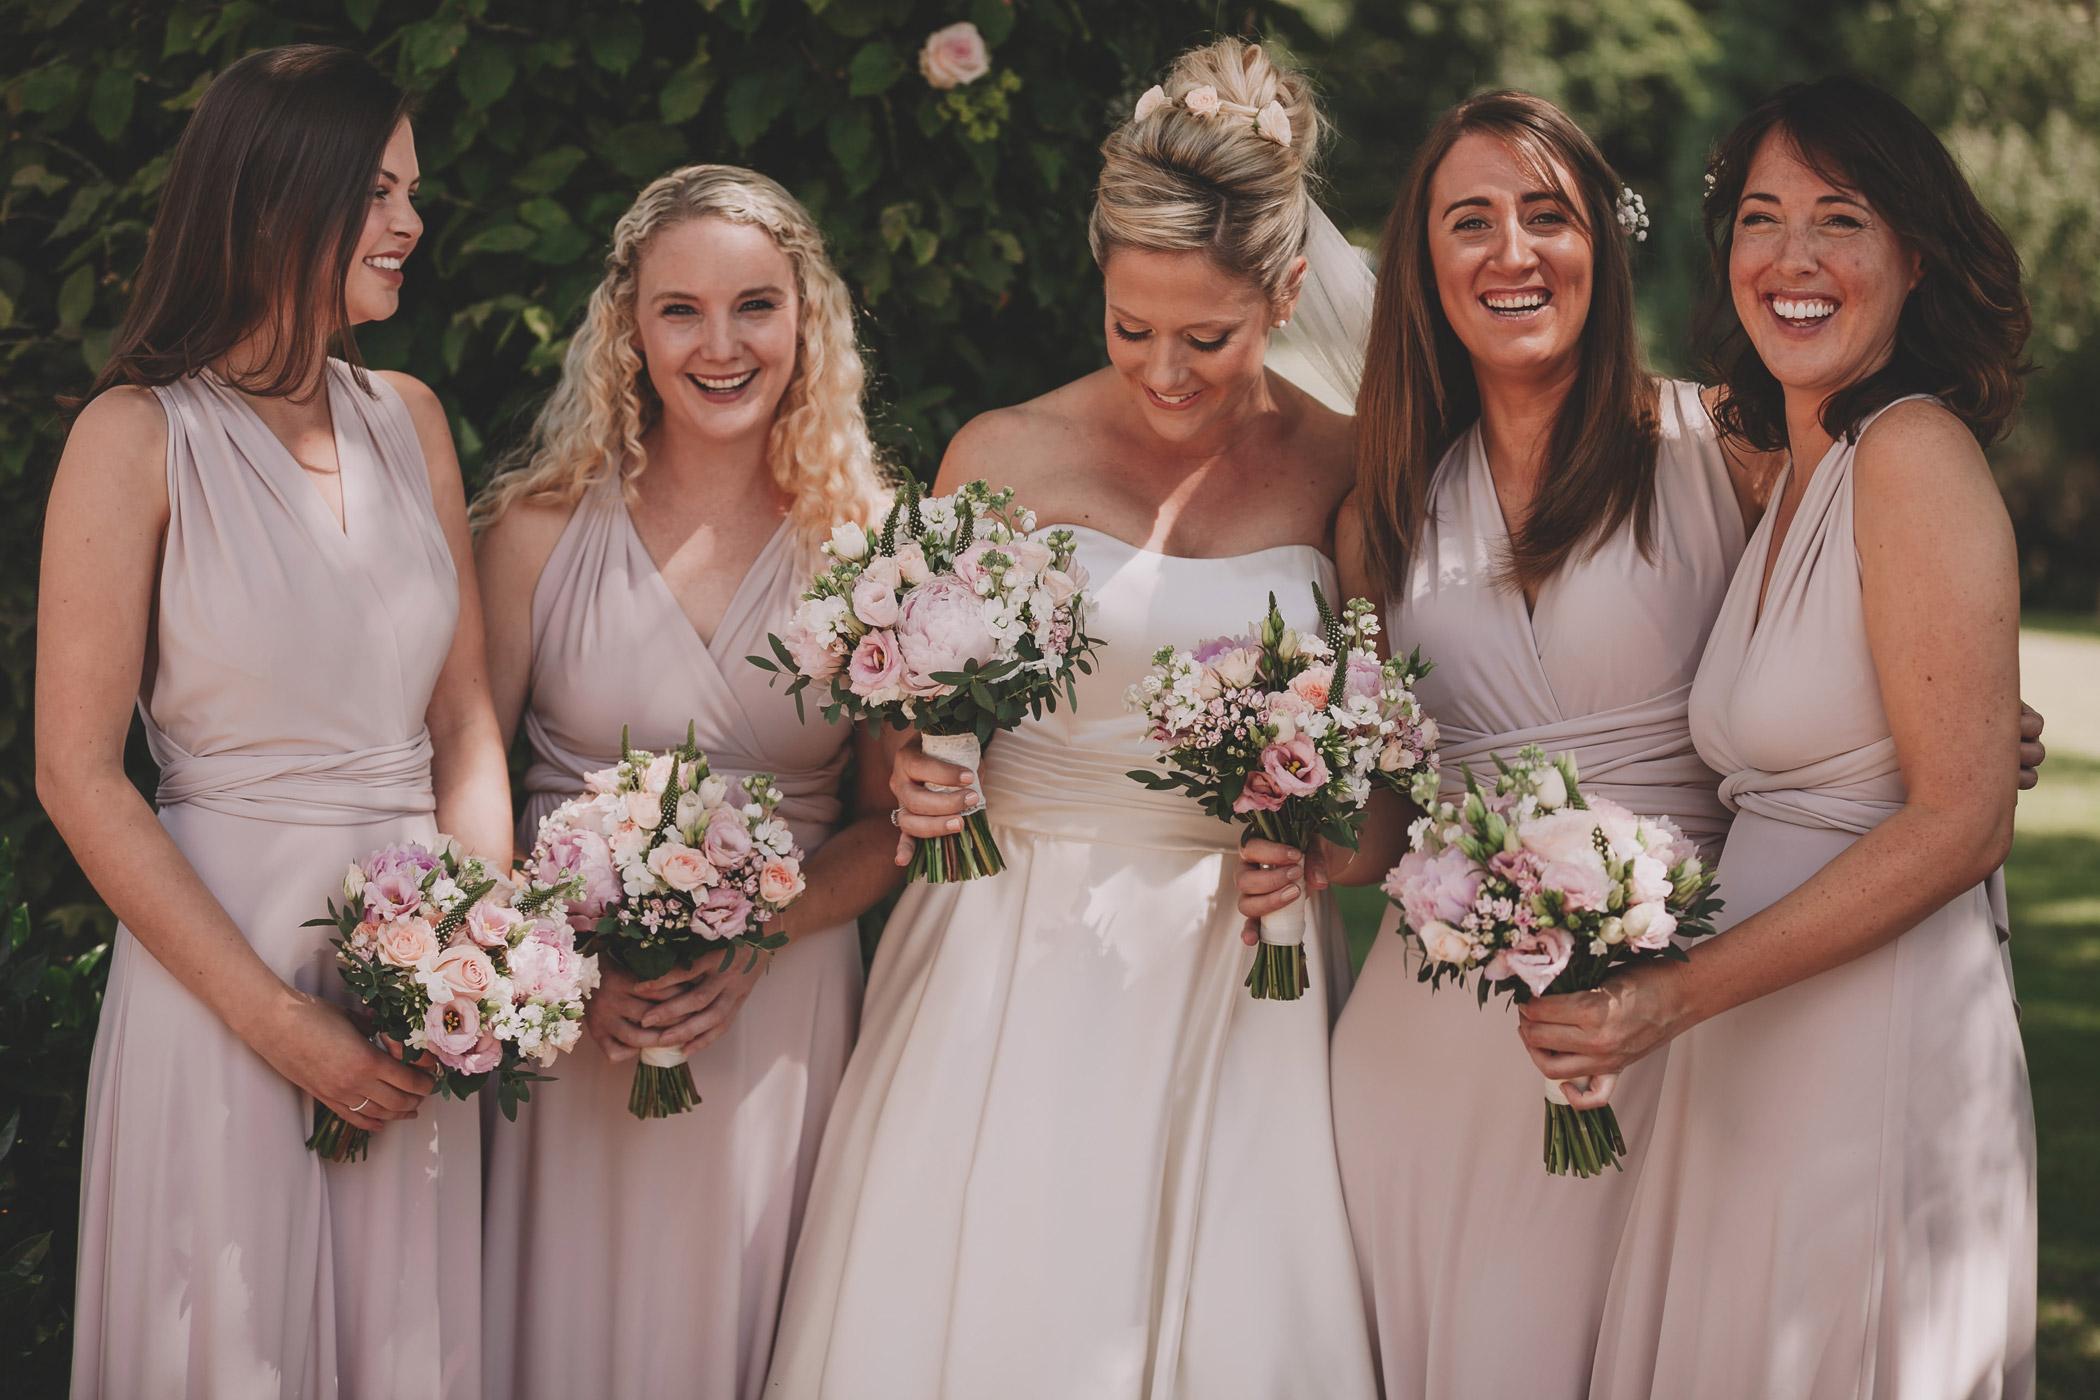 ruth-allen-wedding-photography-photographer-15